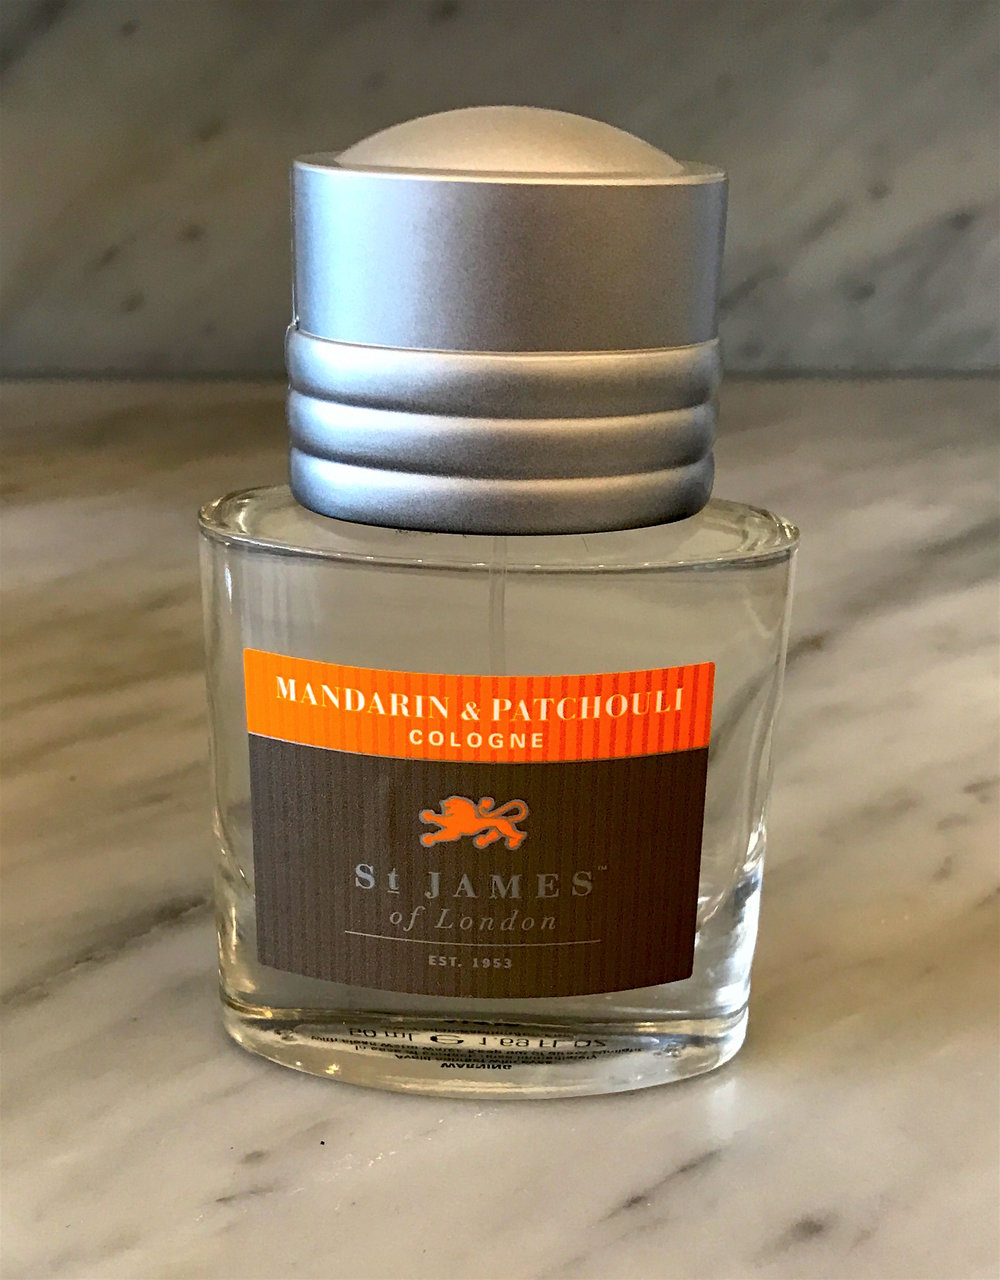 Mandarin & Patchouli